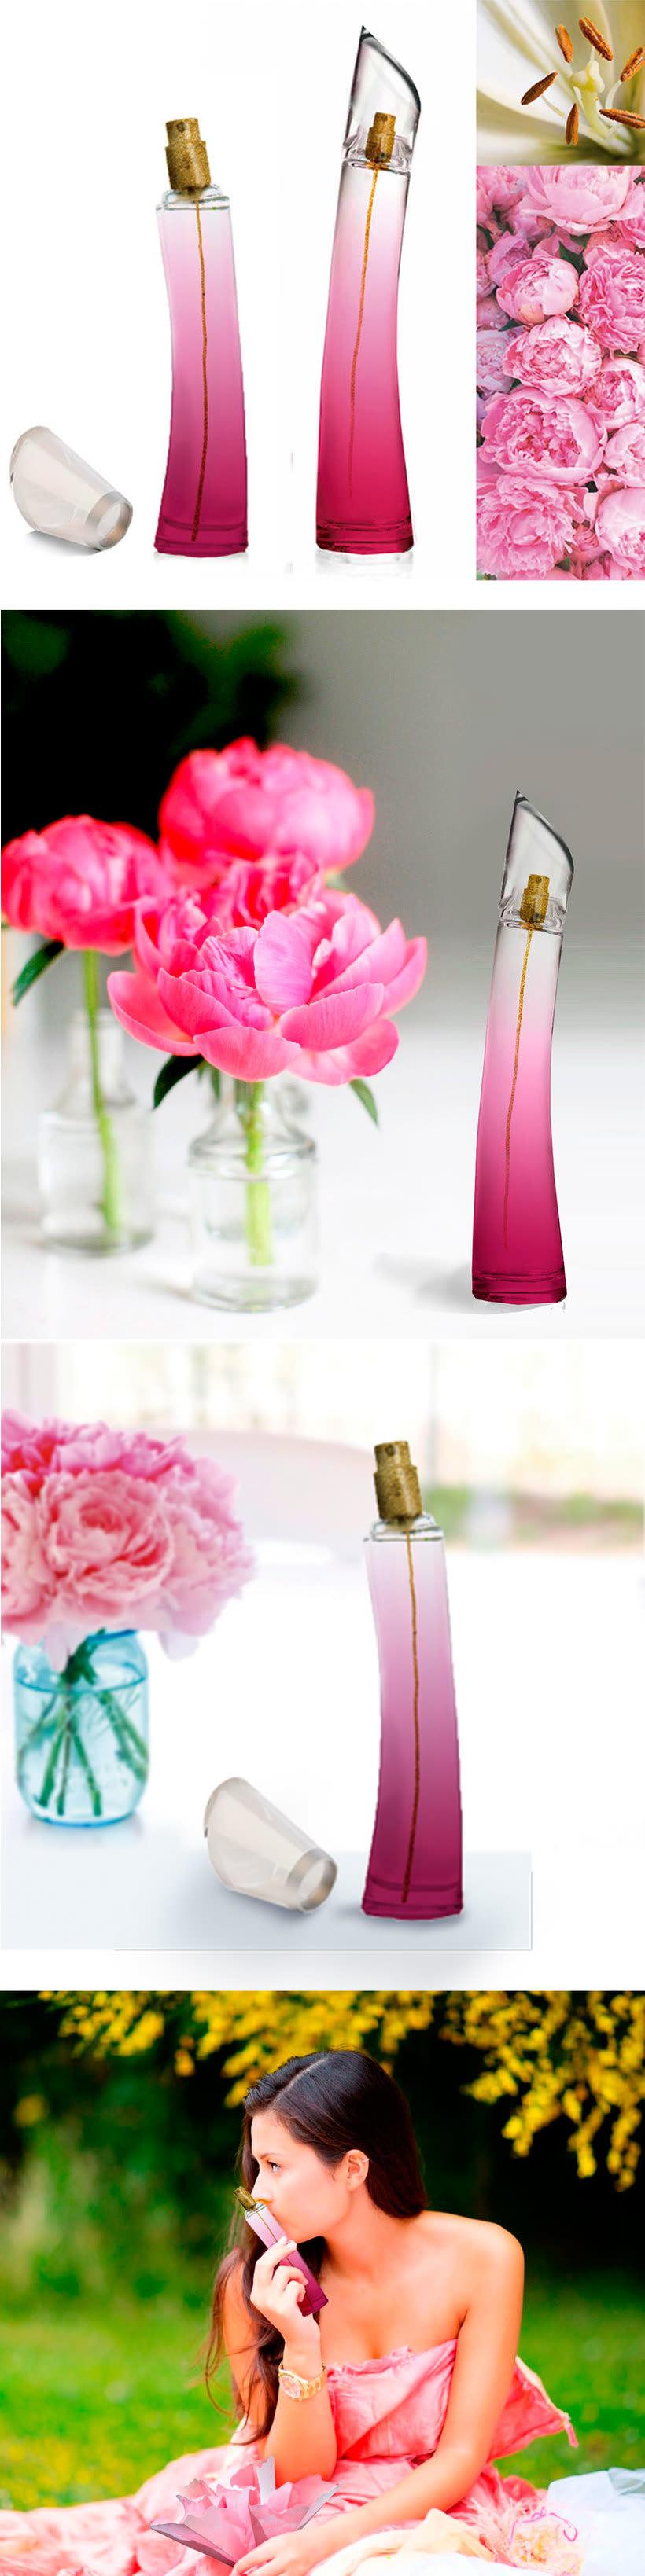 Bloom, perfume 6